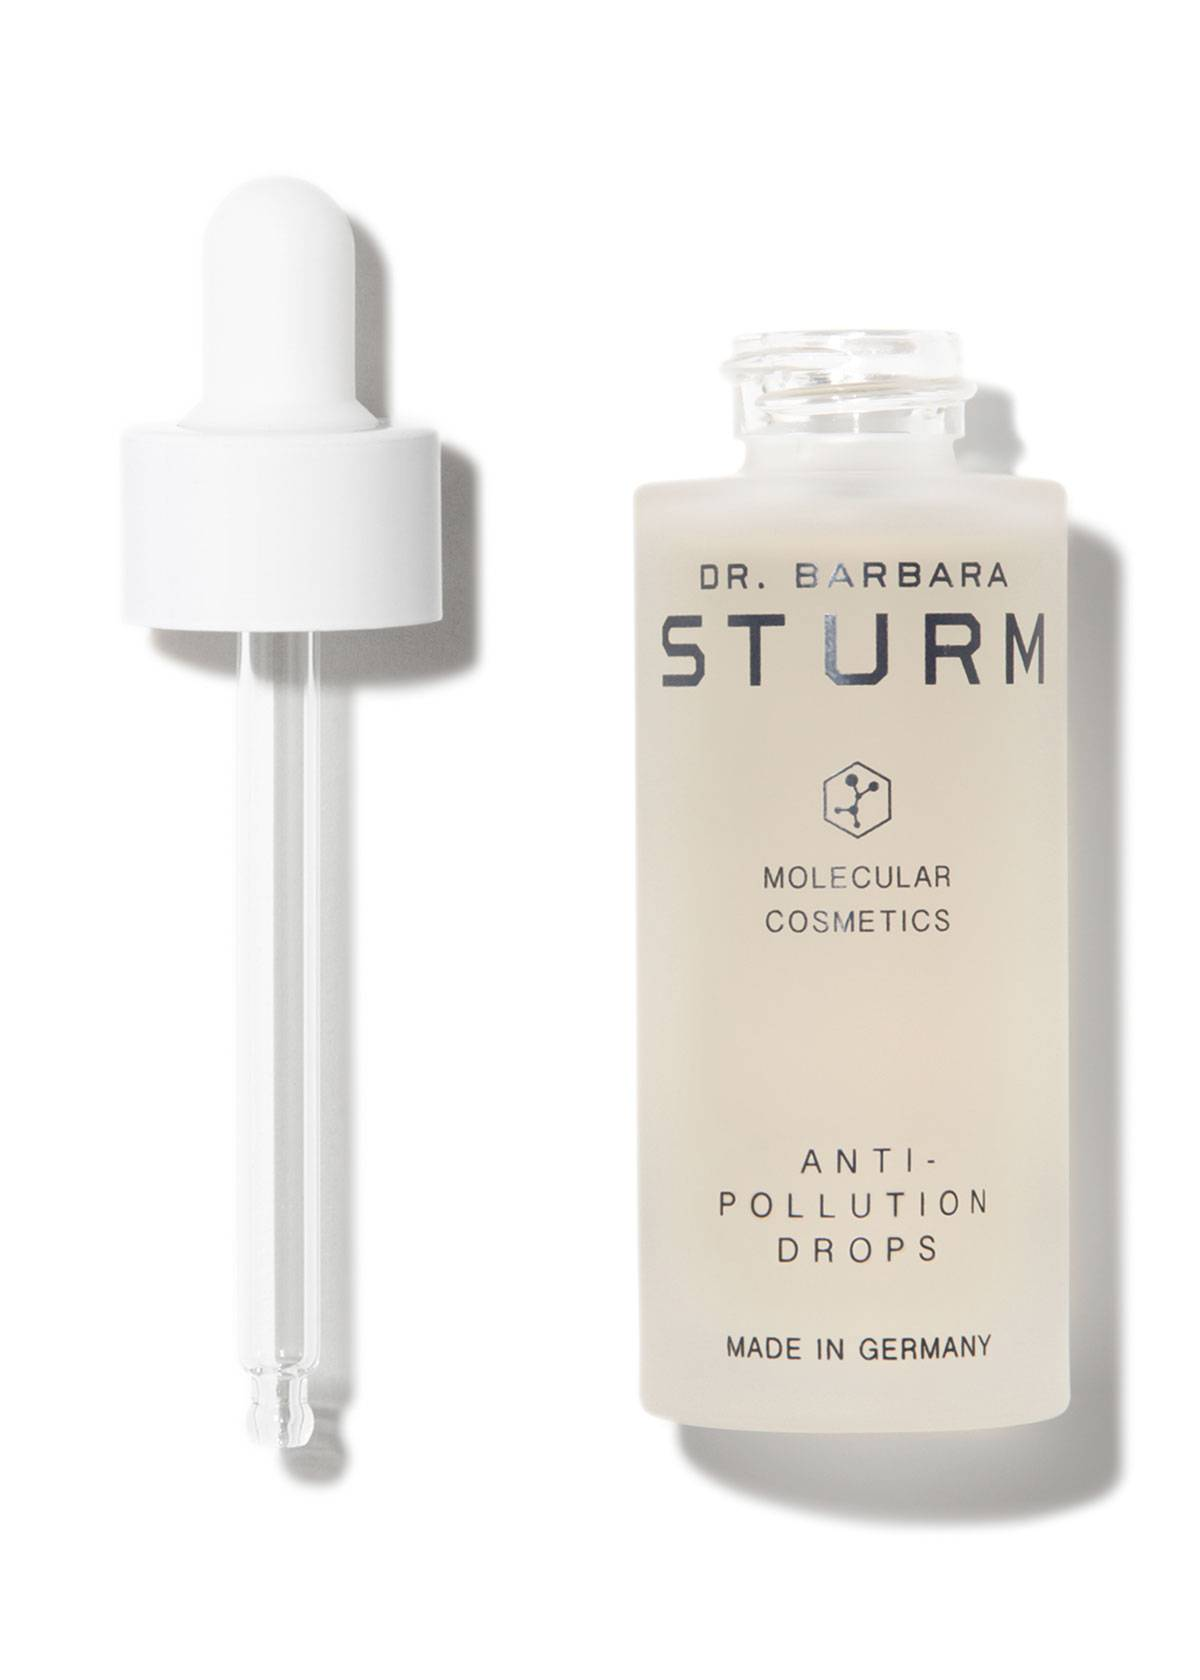 Dr. Barbara Sturm Anti Pollution Drops  - Size: female